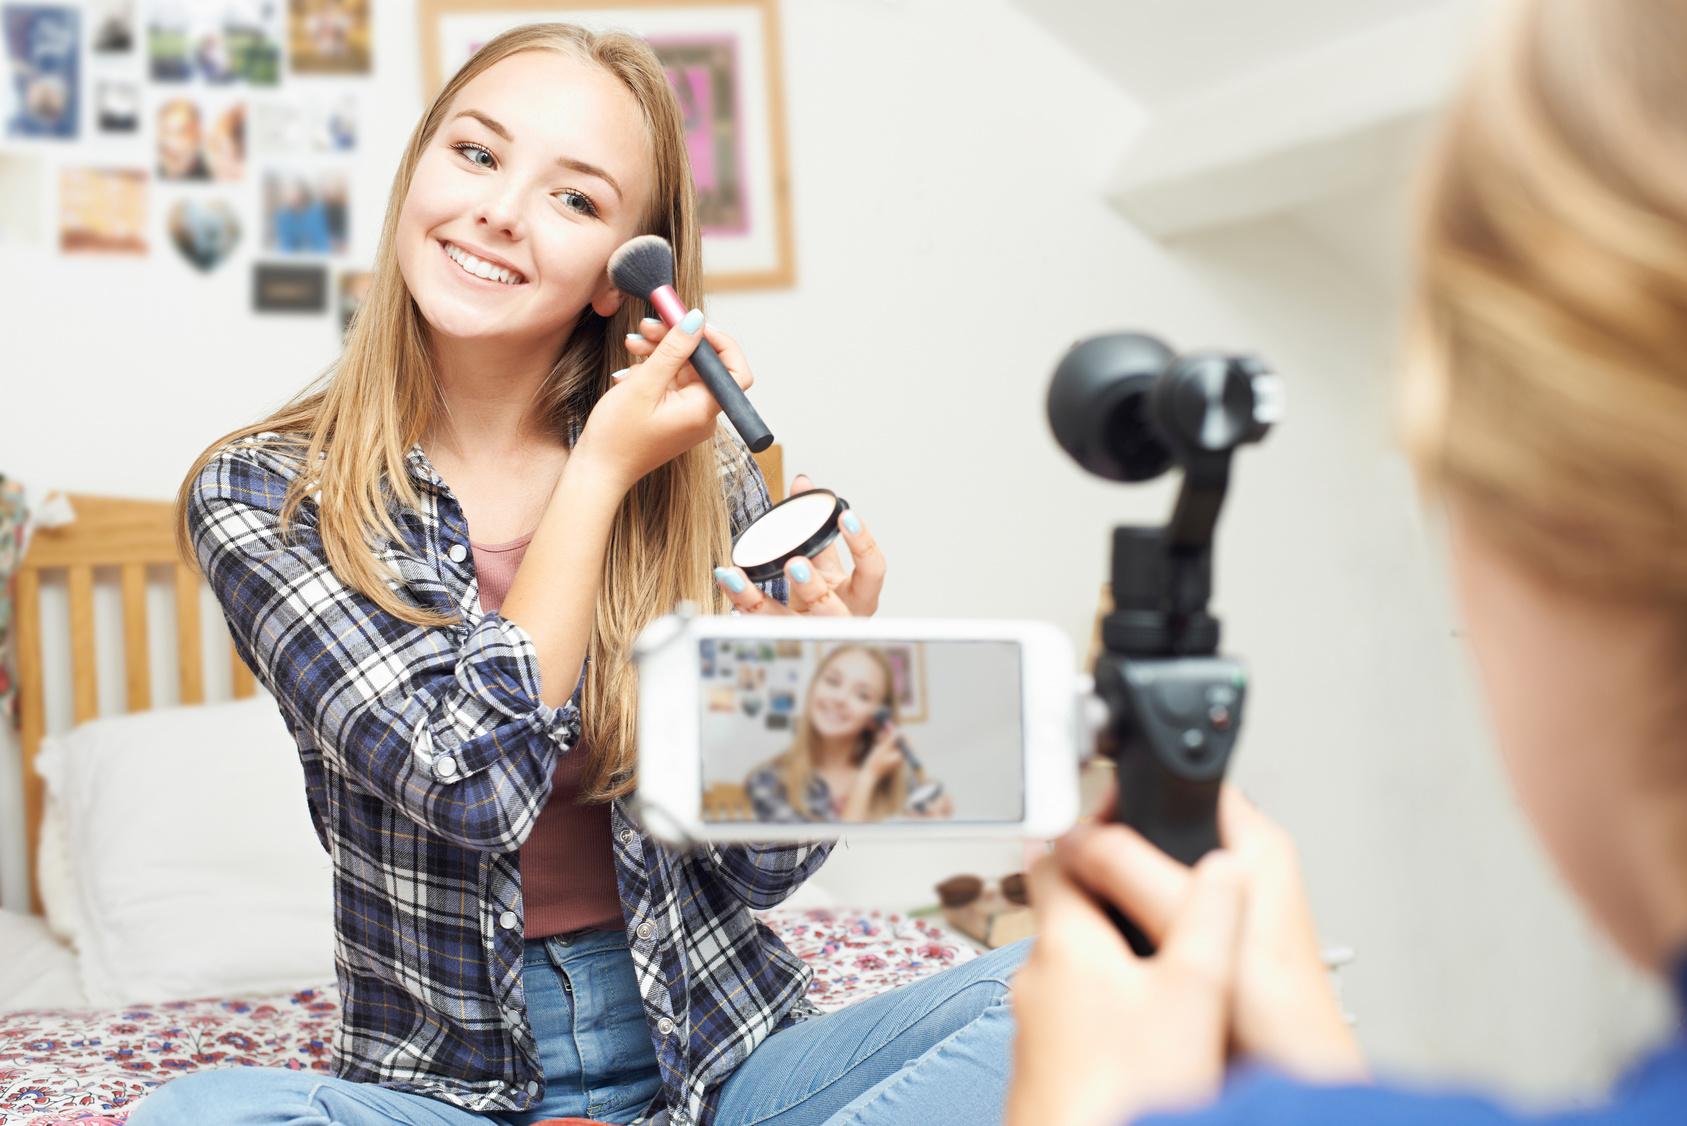 5 Fresh Beauty Blog Ideas To Make You Popular Onblastblog